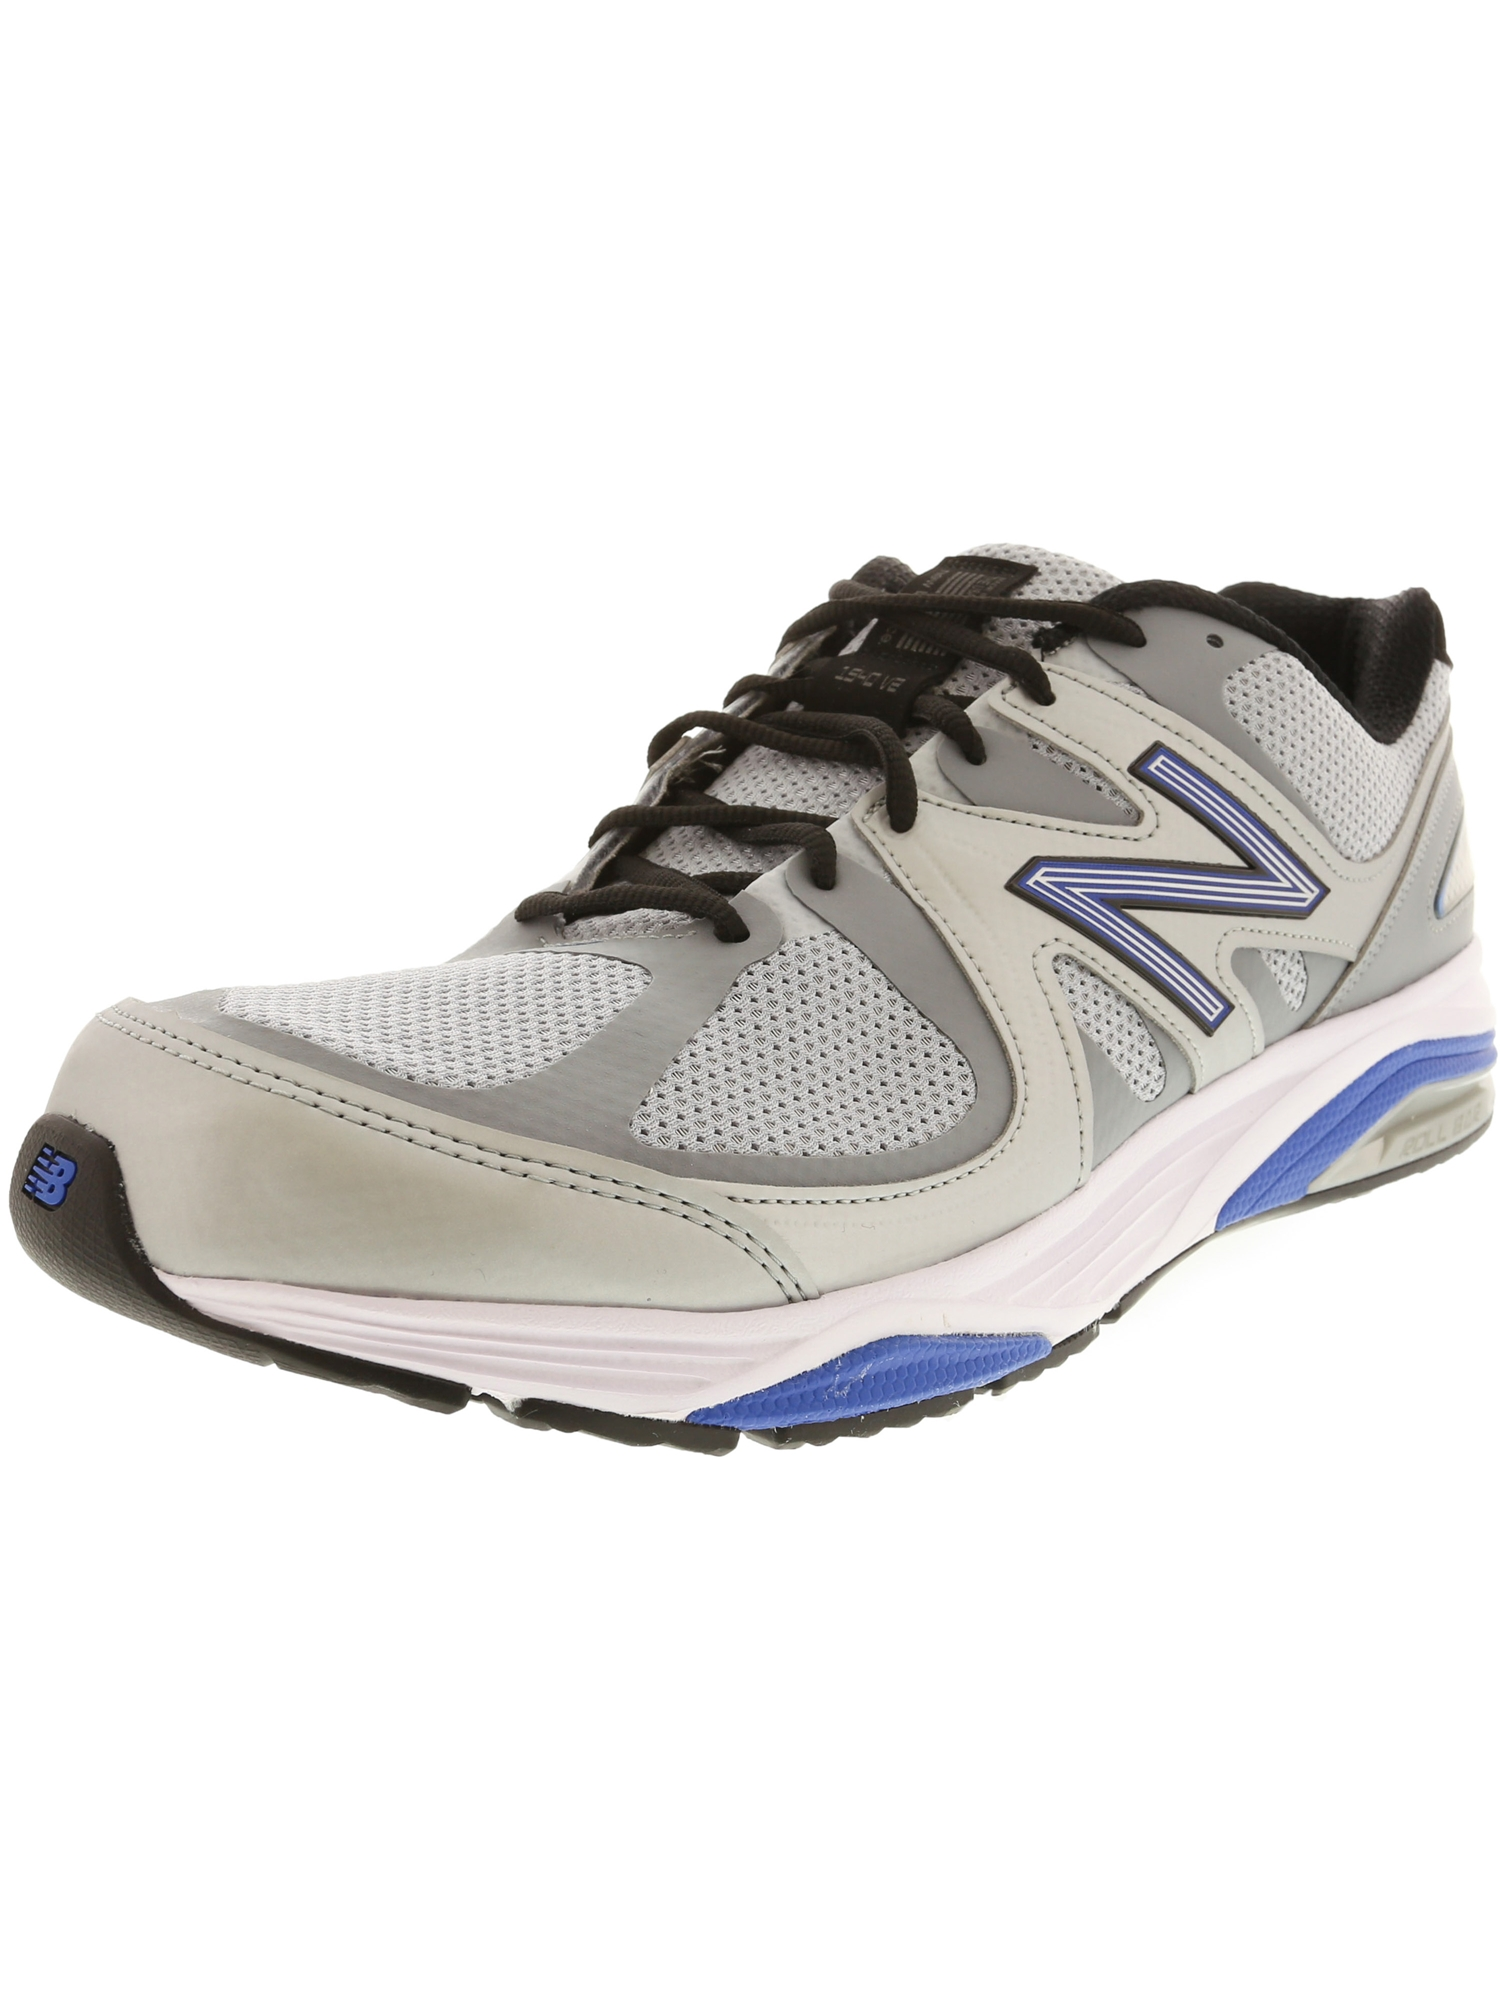 New Balance Men's M1540 Sb2 Ankle-High Mesh Running Shoe - 11W